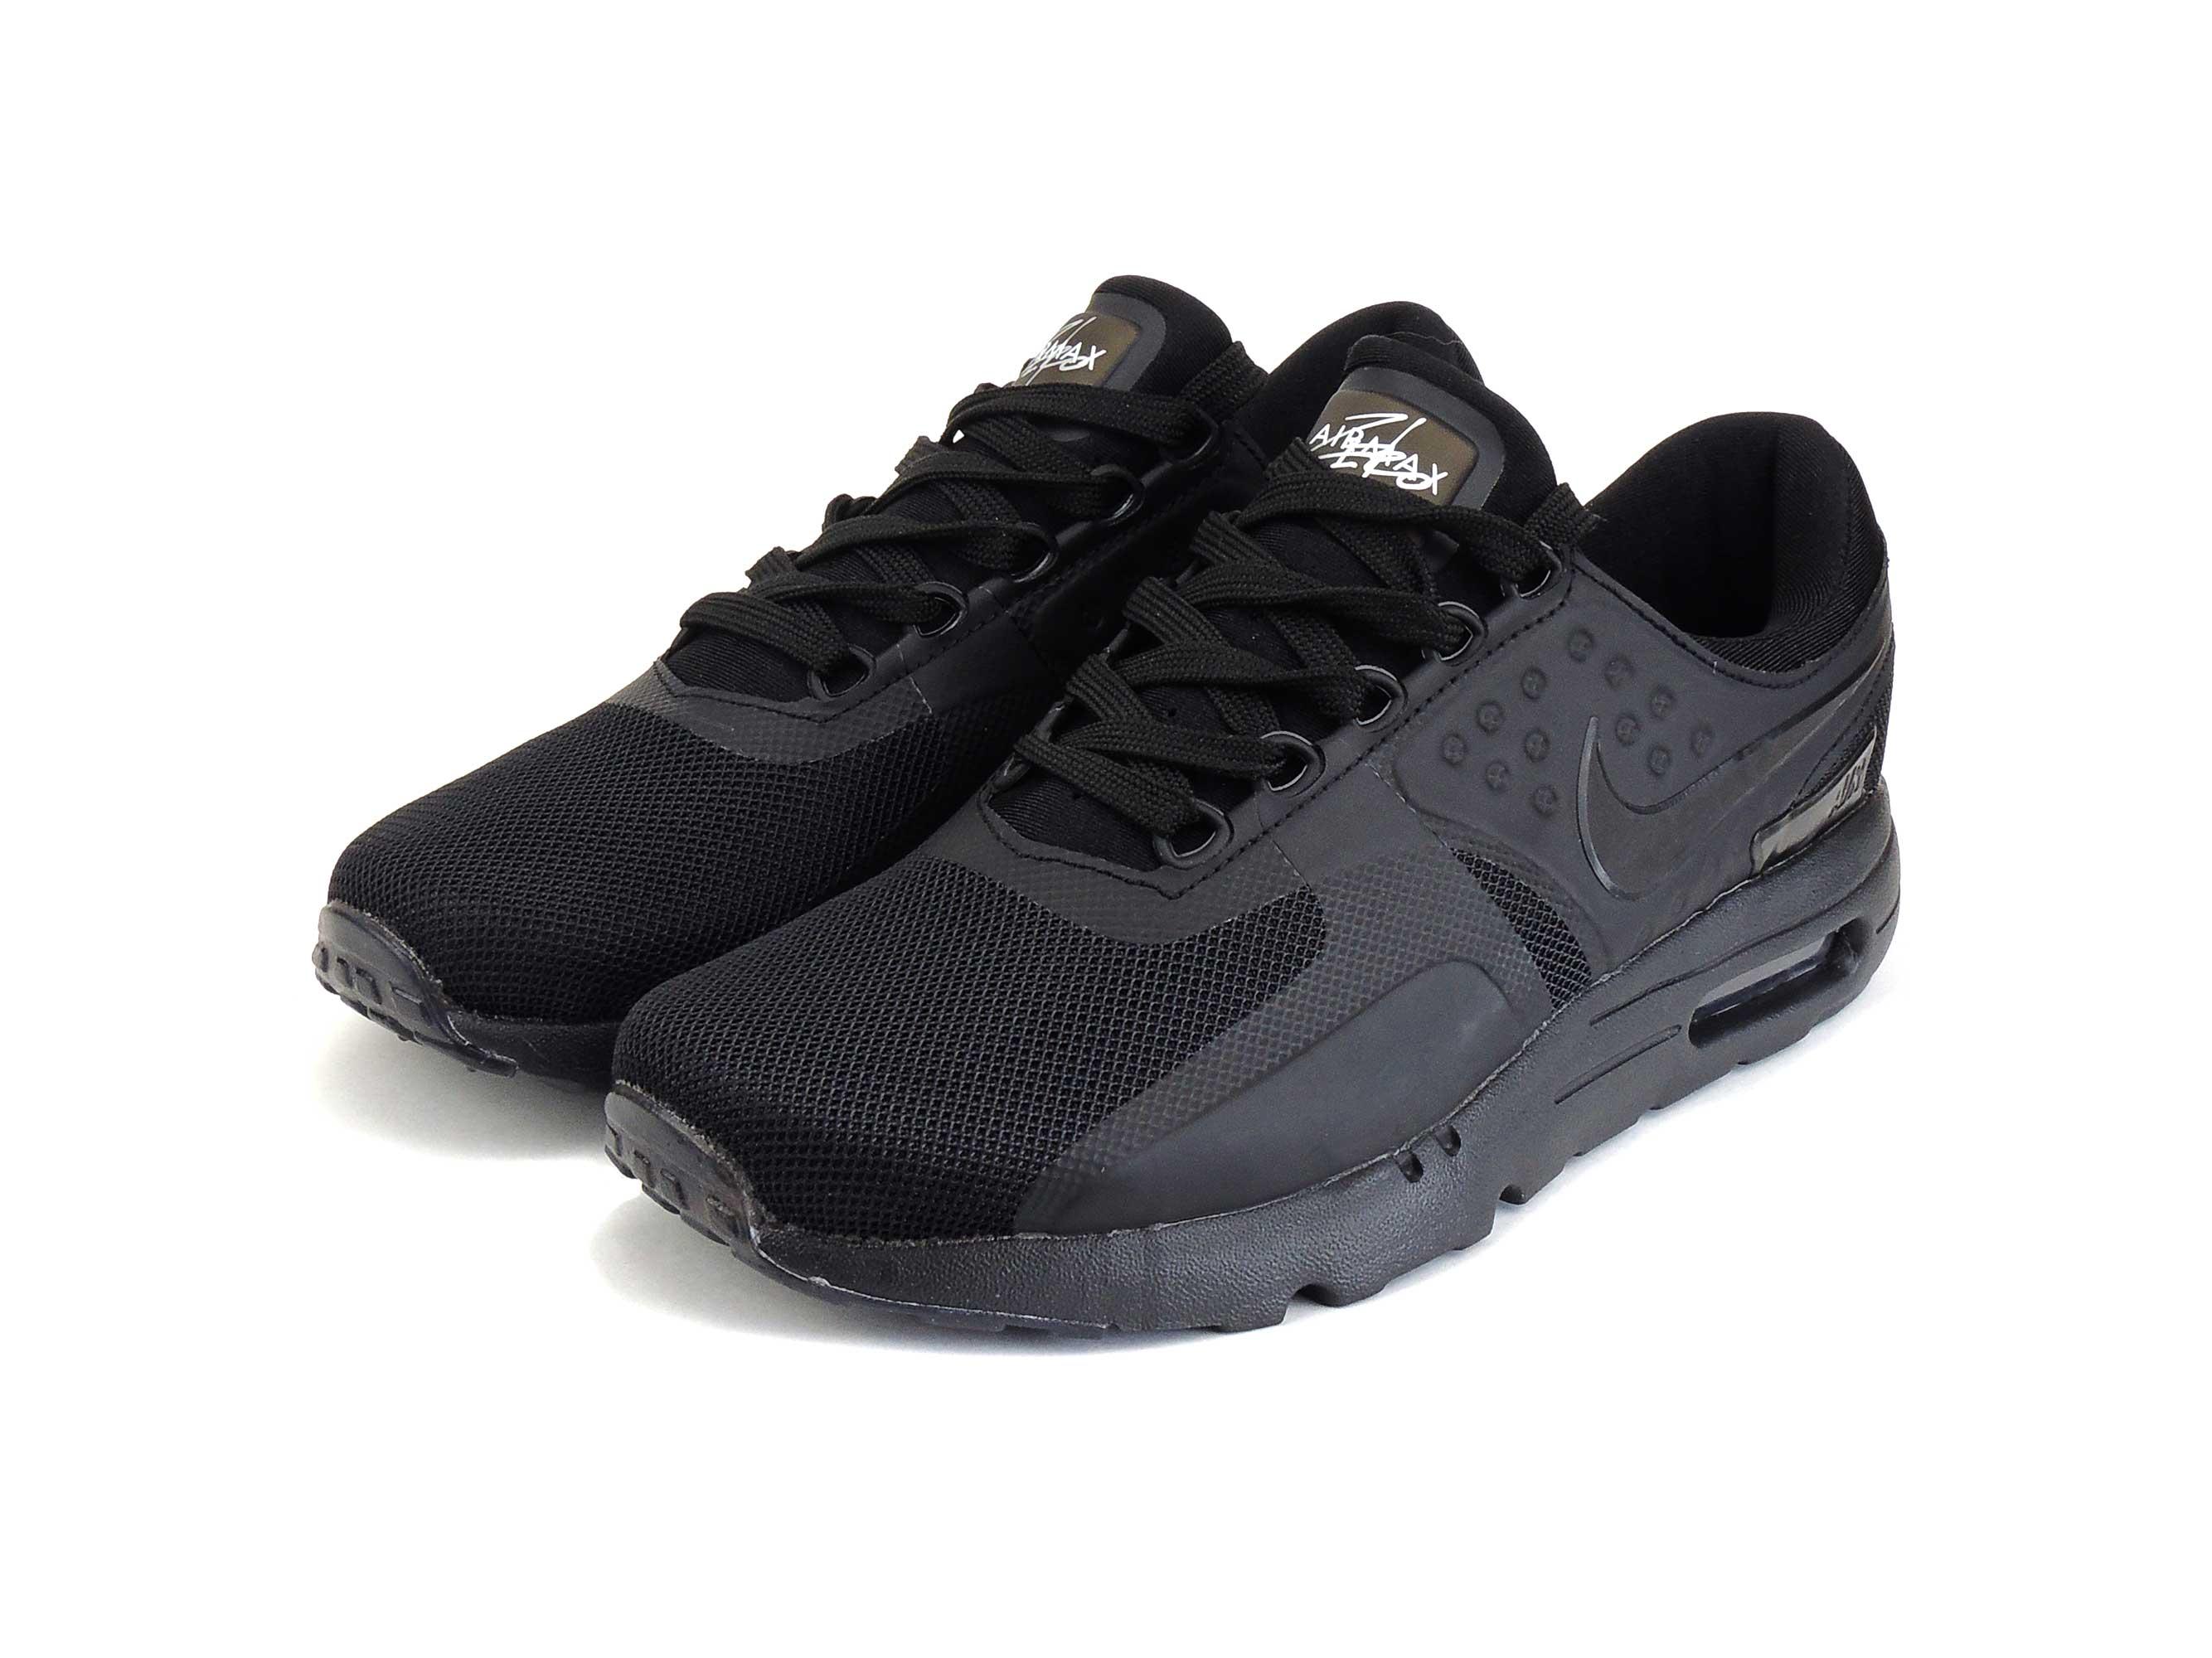 nike air max zero qs all black купить